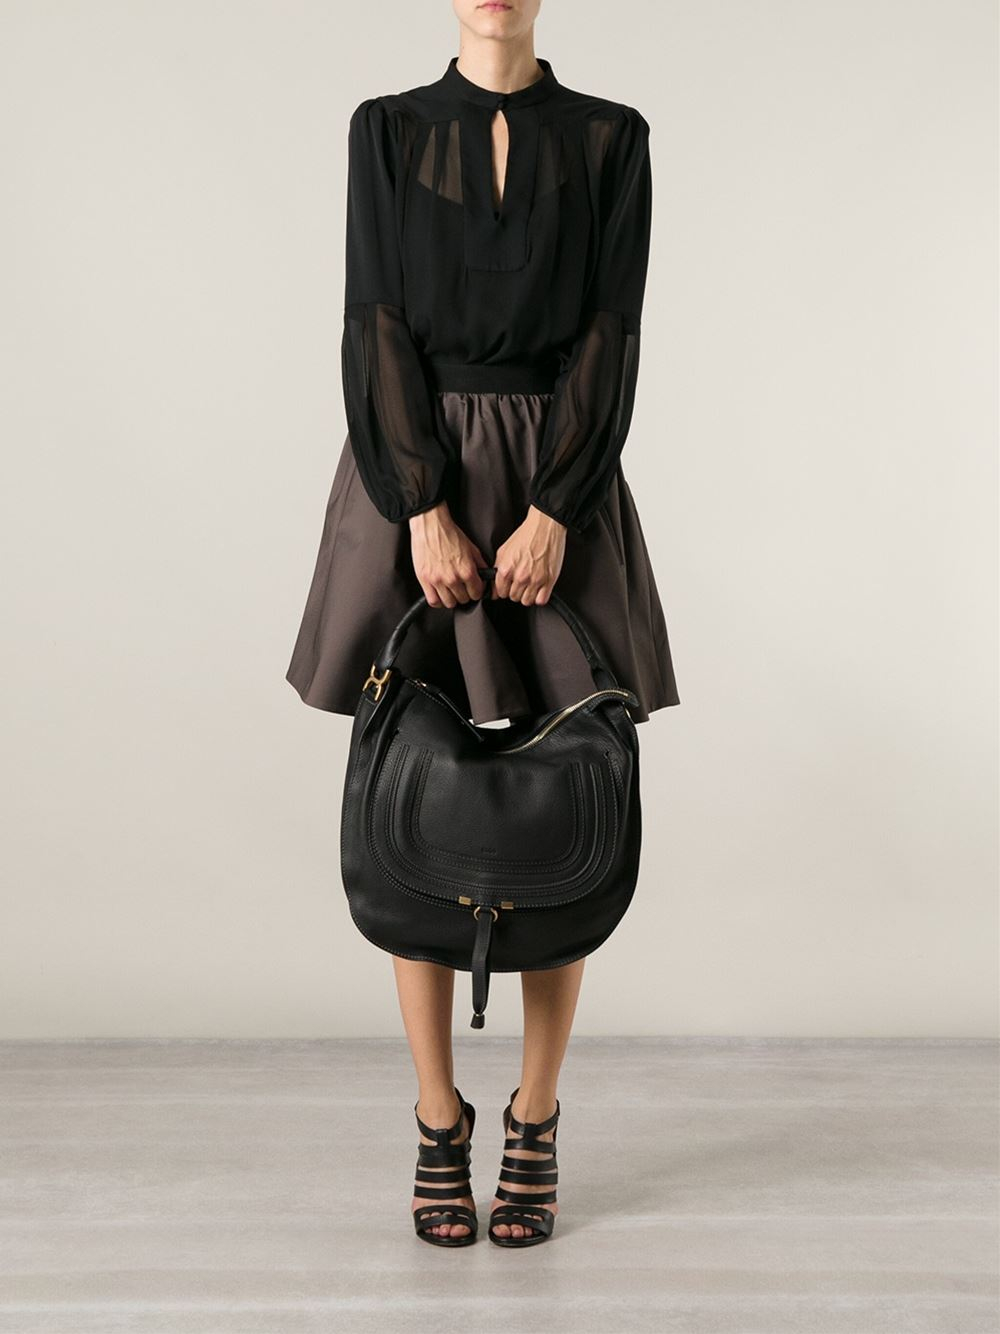 7c6b71a7c Chloé Marcie Hobo Bag in Black - Lyst